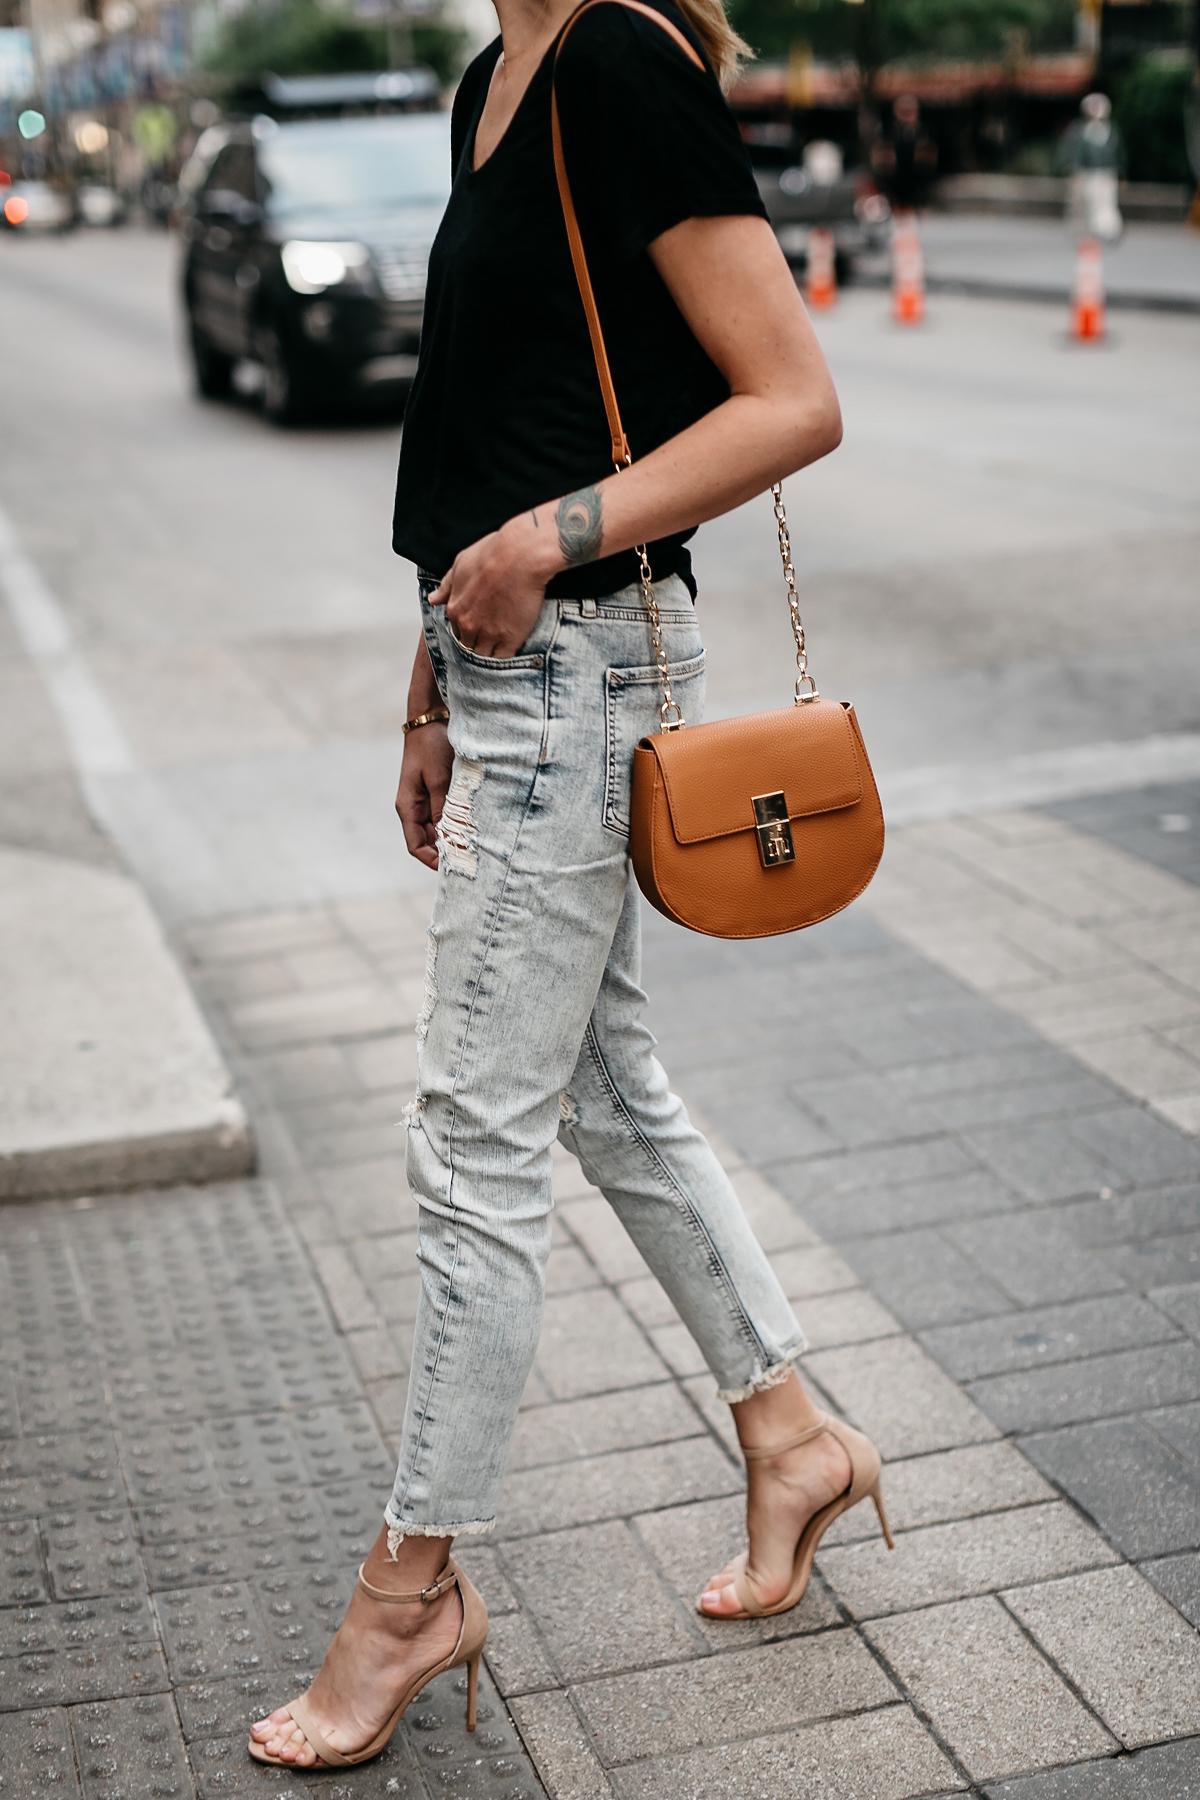 Woman Wearing Express Black Tshirt Express Ripped Jeans Tan Ankle Strap Heeled Sandals Tan Handbag Fashion Jackson Dallas Blogger Fashion Blogger Street Style